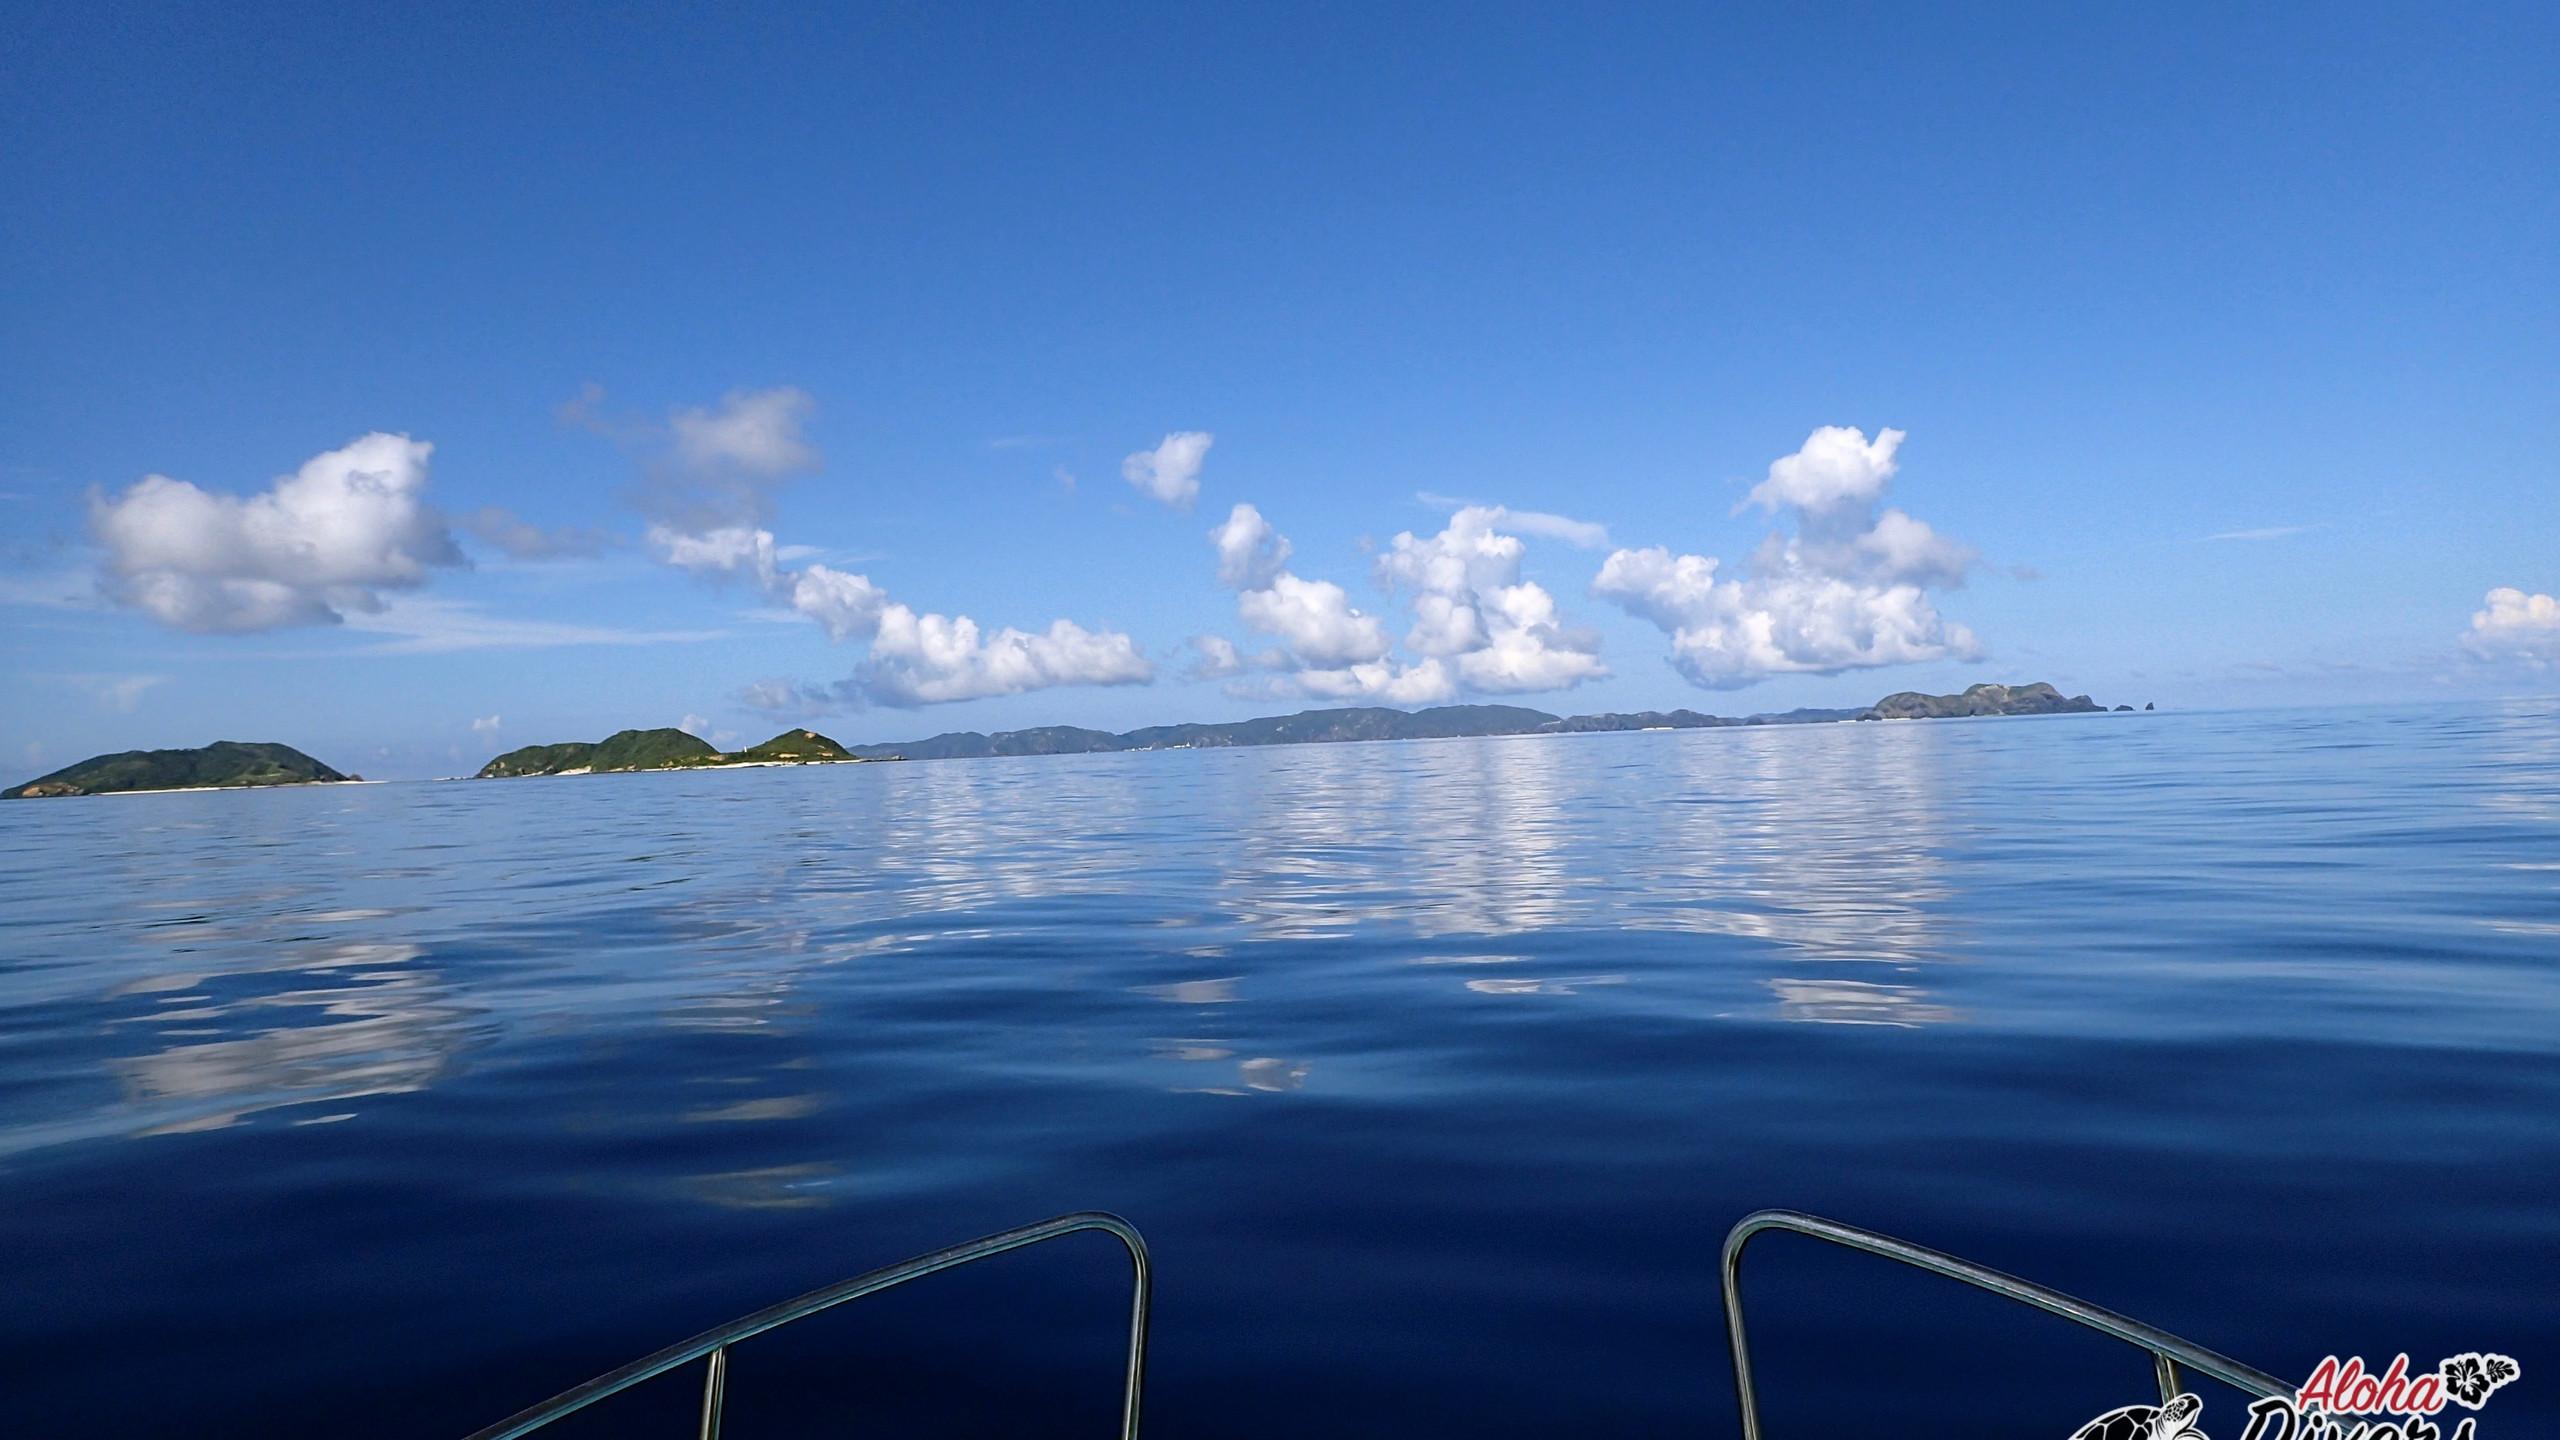 Mergulho em Kerama - Aloha Divers Okinawa